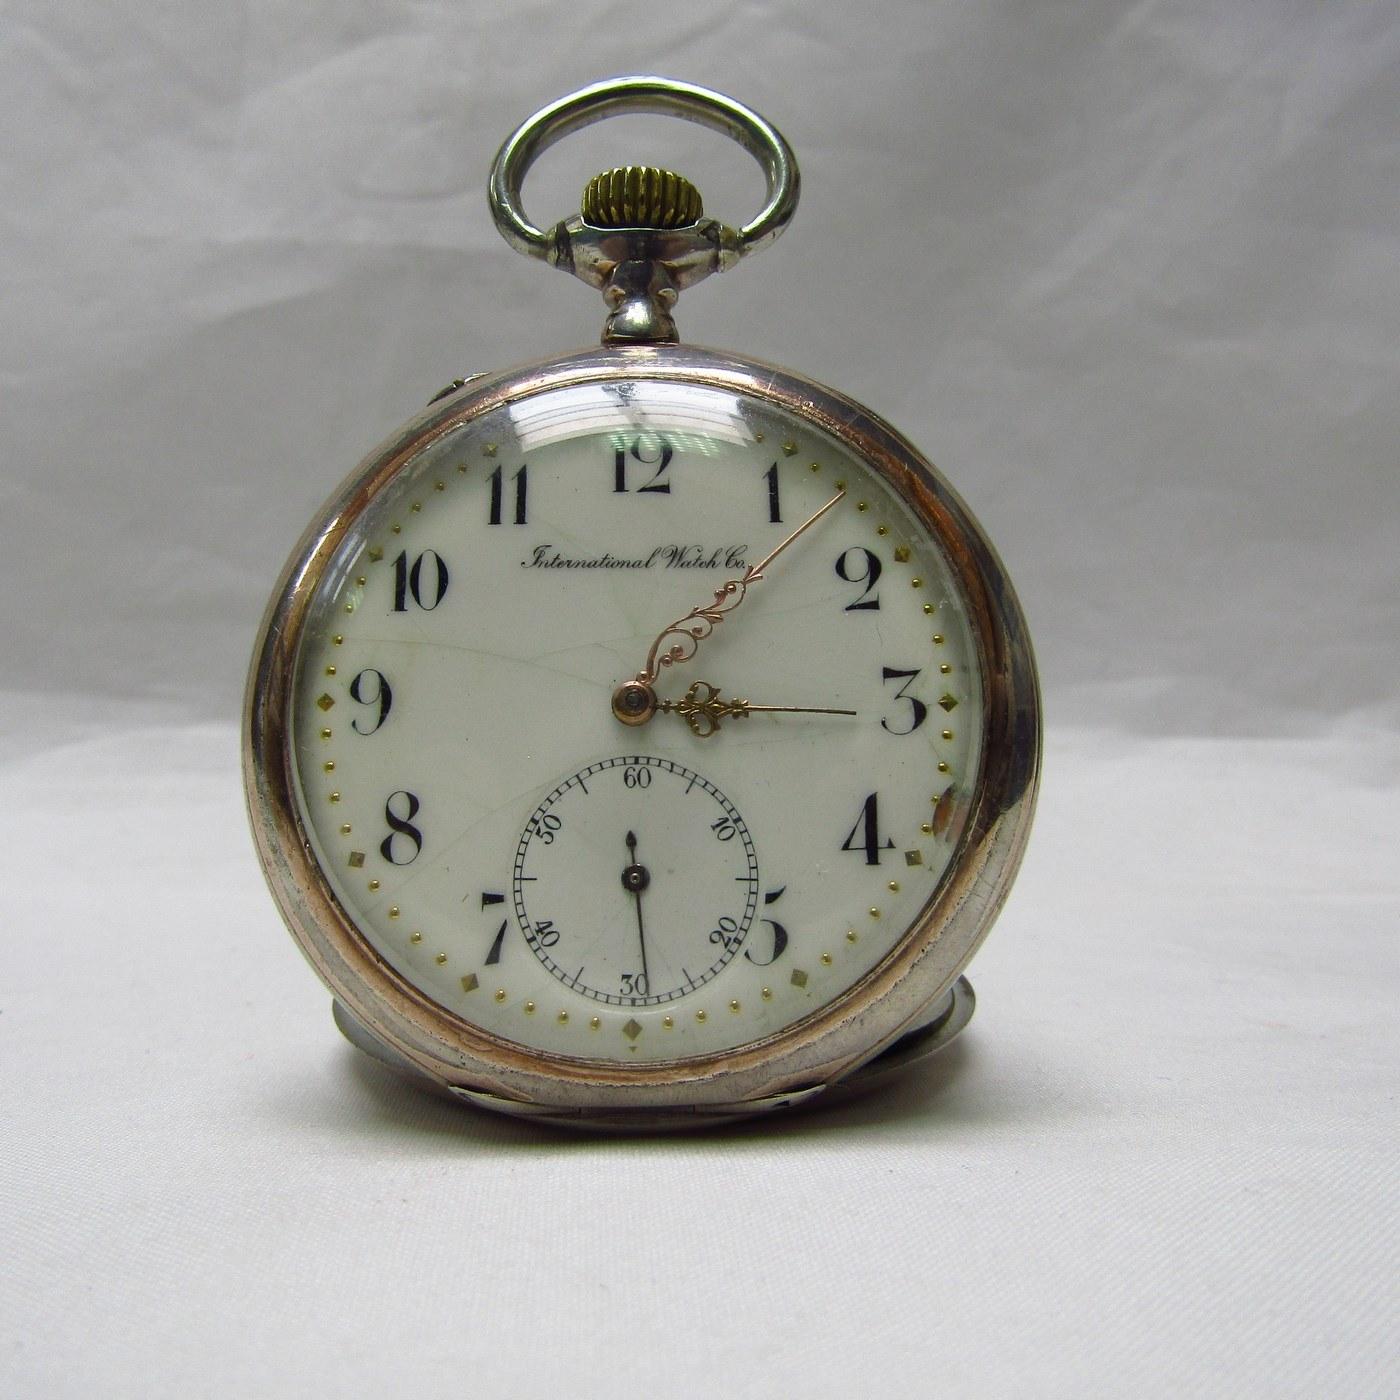 (IWC) International Watch Company. Reloj de Bolsillo, lepine y remontoir. Suiza, Año 1907.